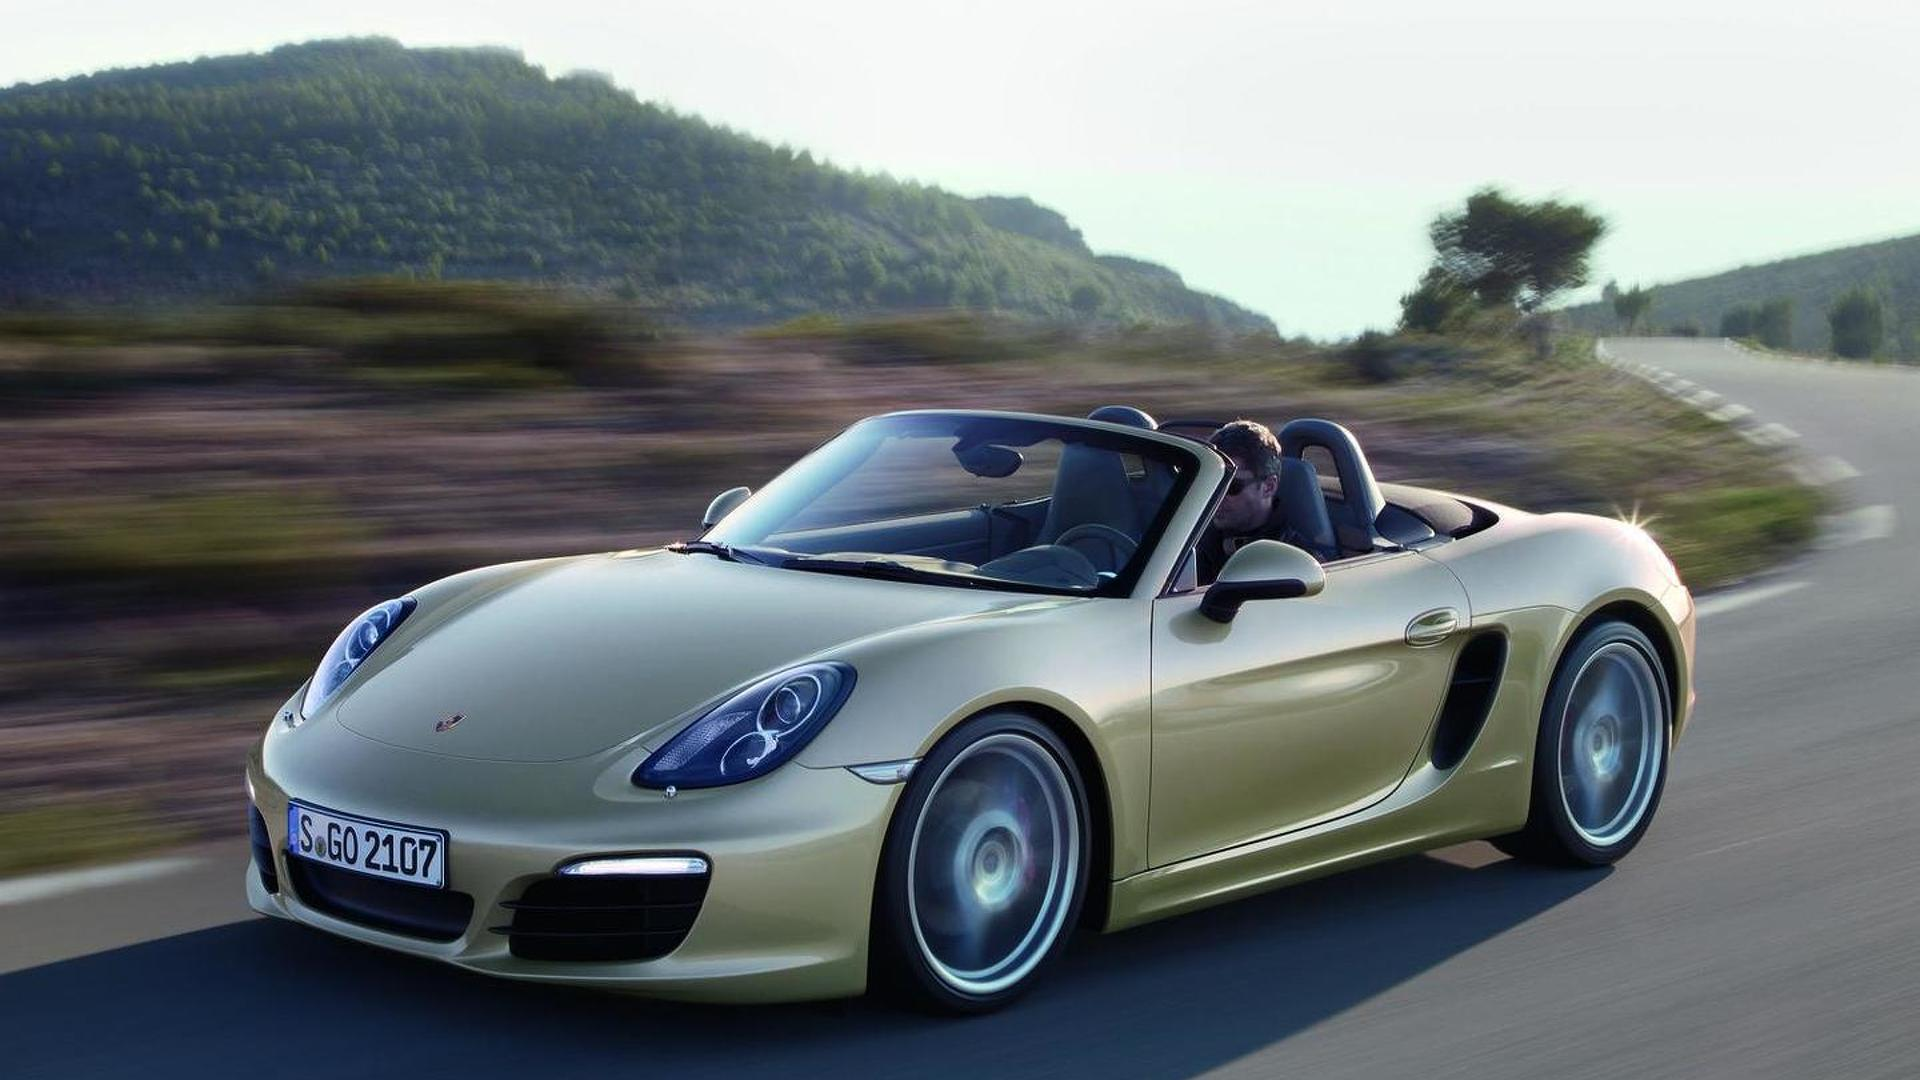 porsche 550 spyder pushed back to 2017 wont be based on the vw bluesport report - Porsche Spyder 550 2014